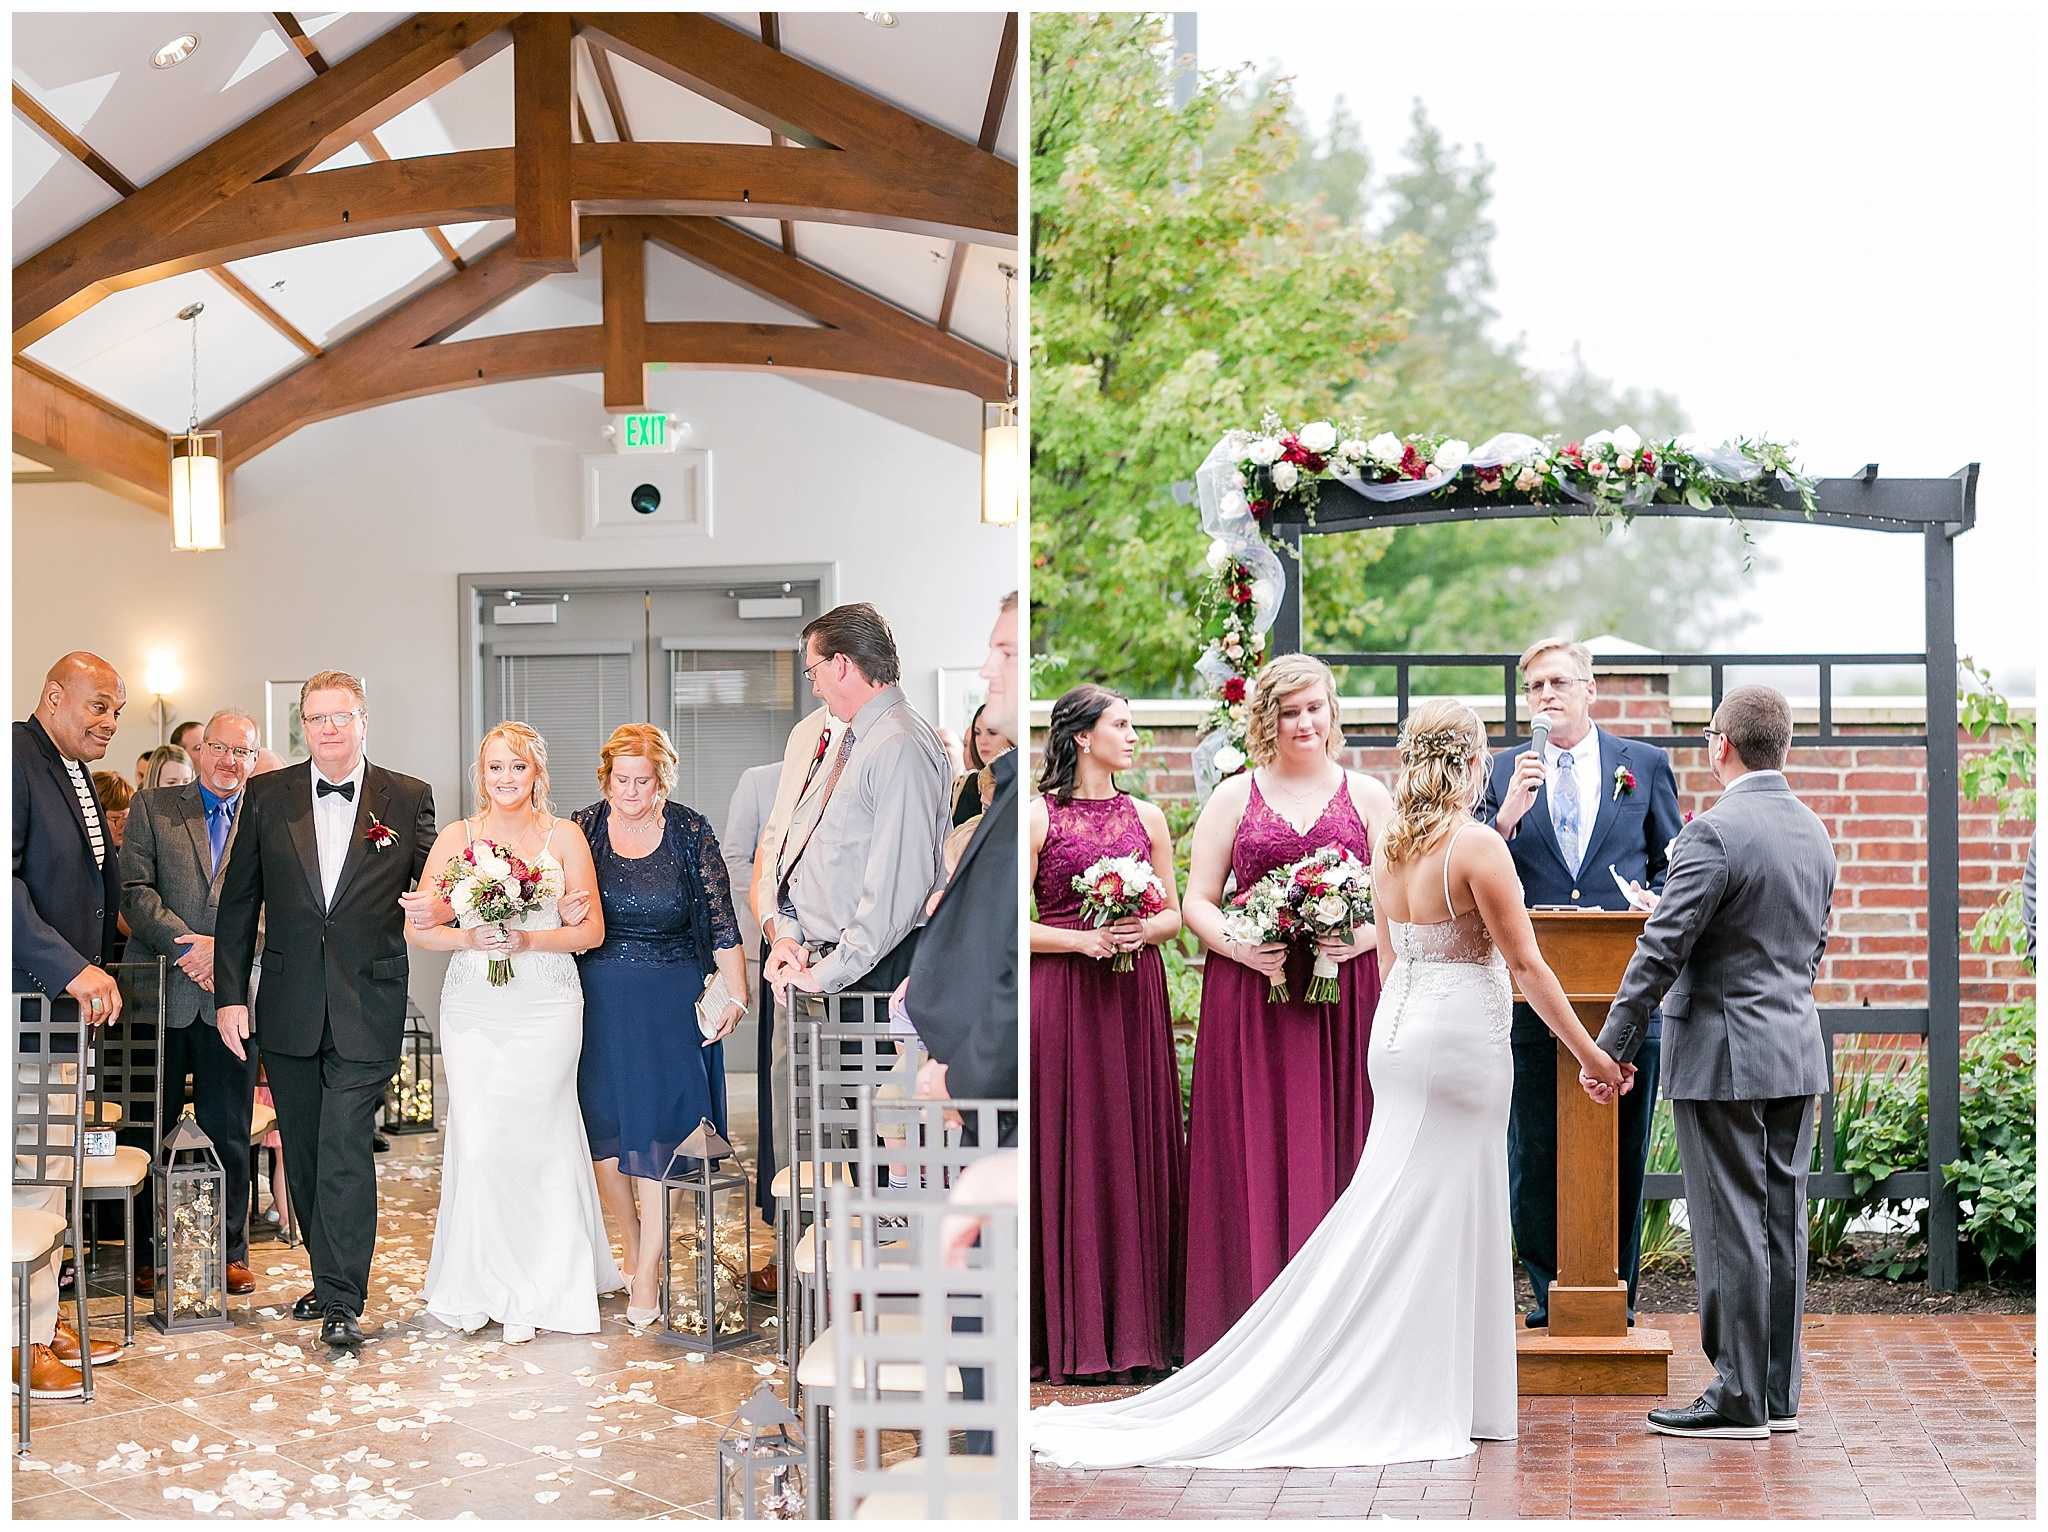 noahs_event_venue_sun_pairie_madison_wisconsin_wedding_photographers_0288.jpg